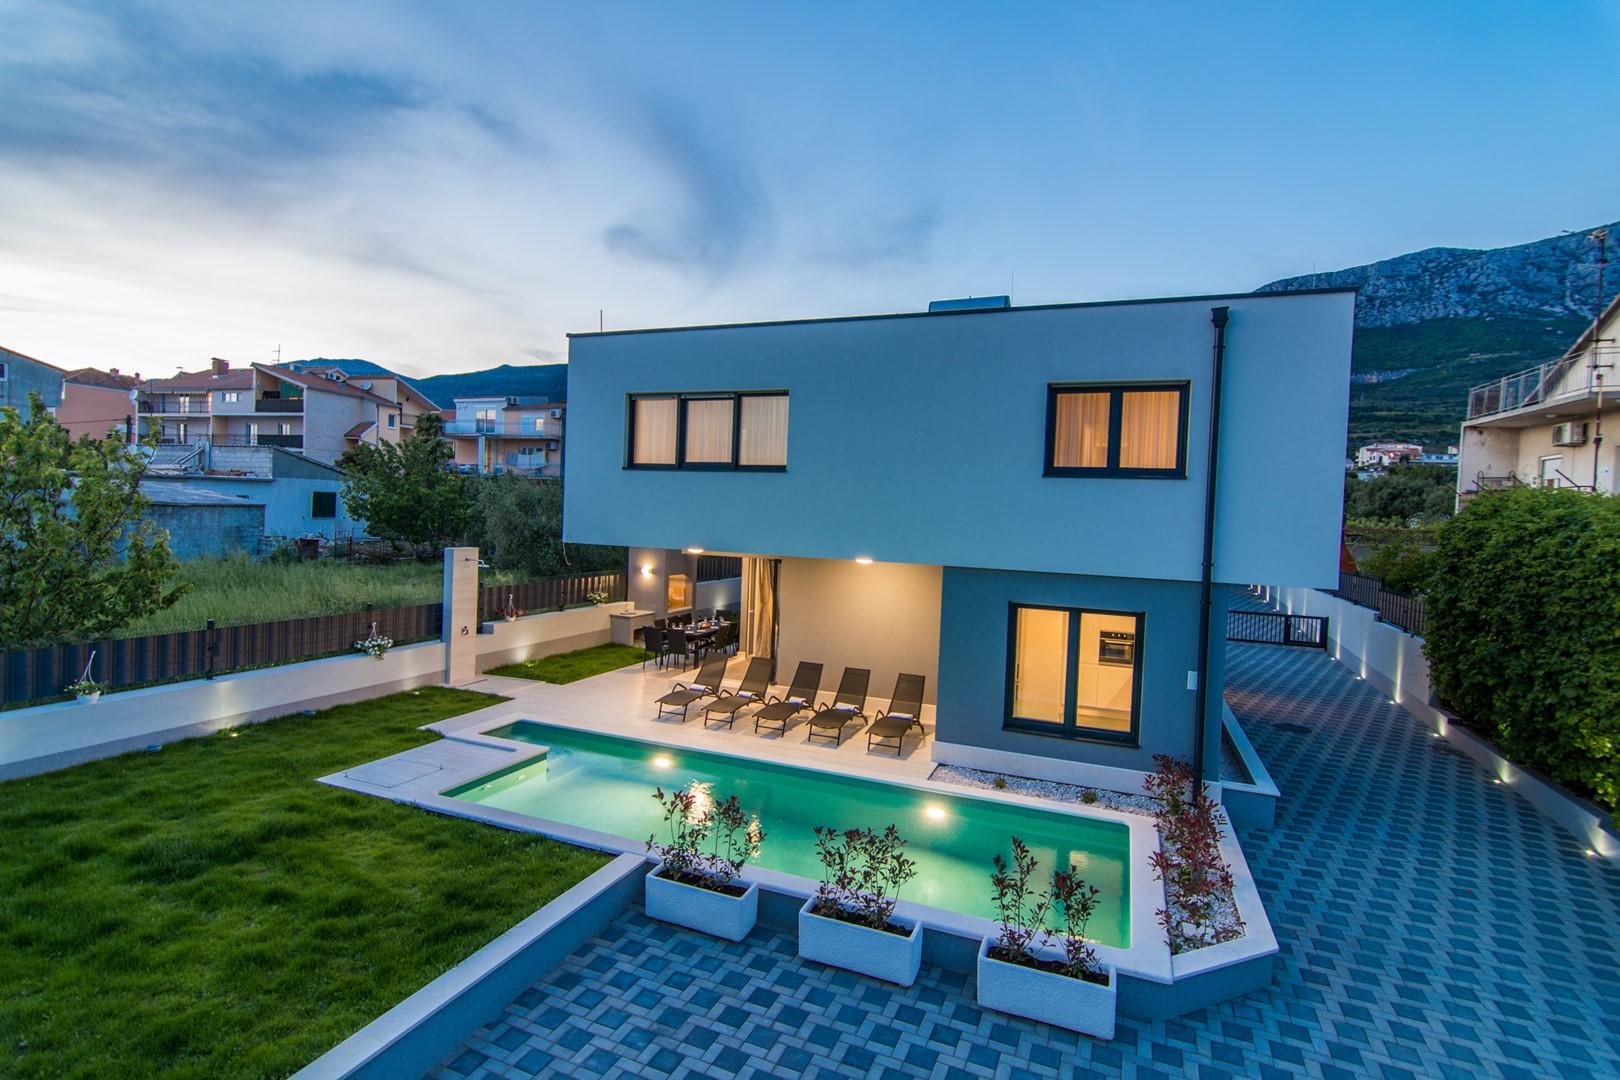 Alternativer Eigenschaftsname  Luxusvilla Split La  in Kroatien